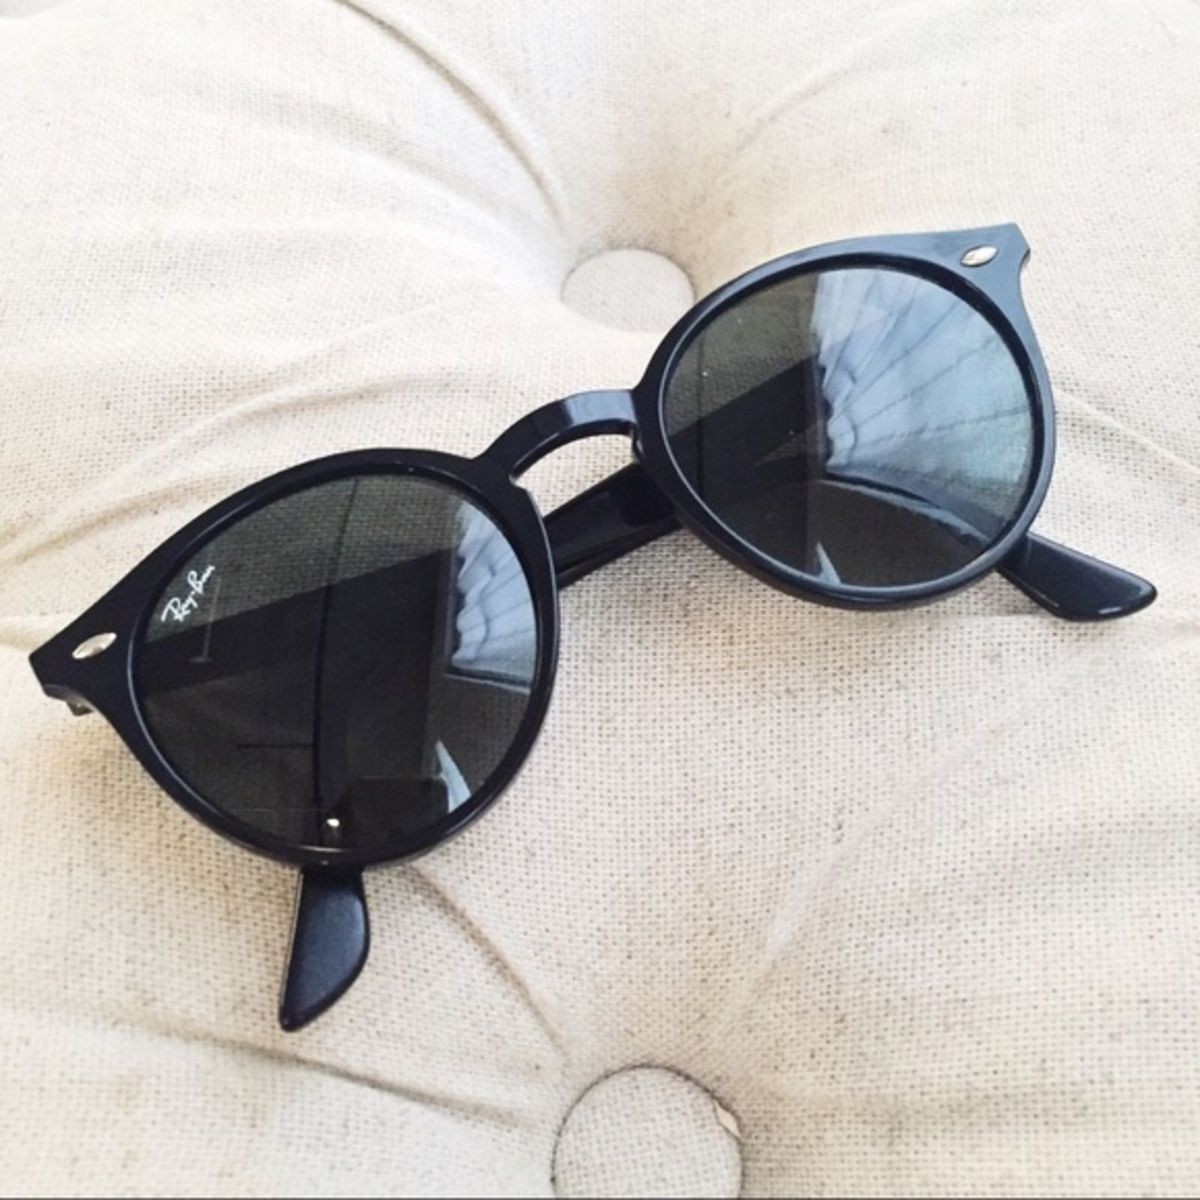 ray ban round highstreet - óculos ray-ban.  Czm6ly9wag90b3muzw5qb2vplmnvbs5ici9wcm9kdwn0cy81ntu2otk5lzi2ytc4yjkznmrlnjczzdi3owuwmzzjyjmzmmm1ndq0lmpwzw  ... d6e9c48dc2